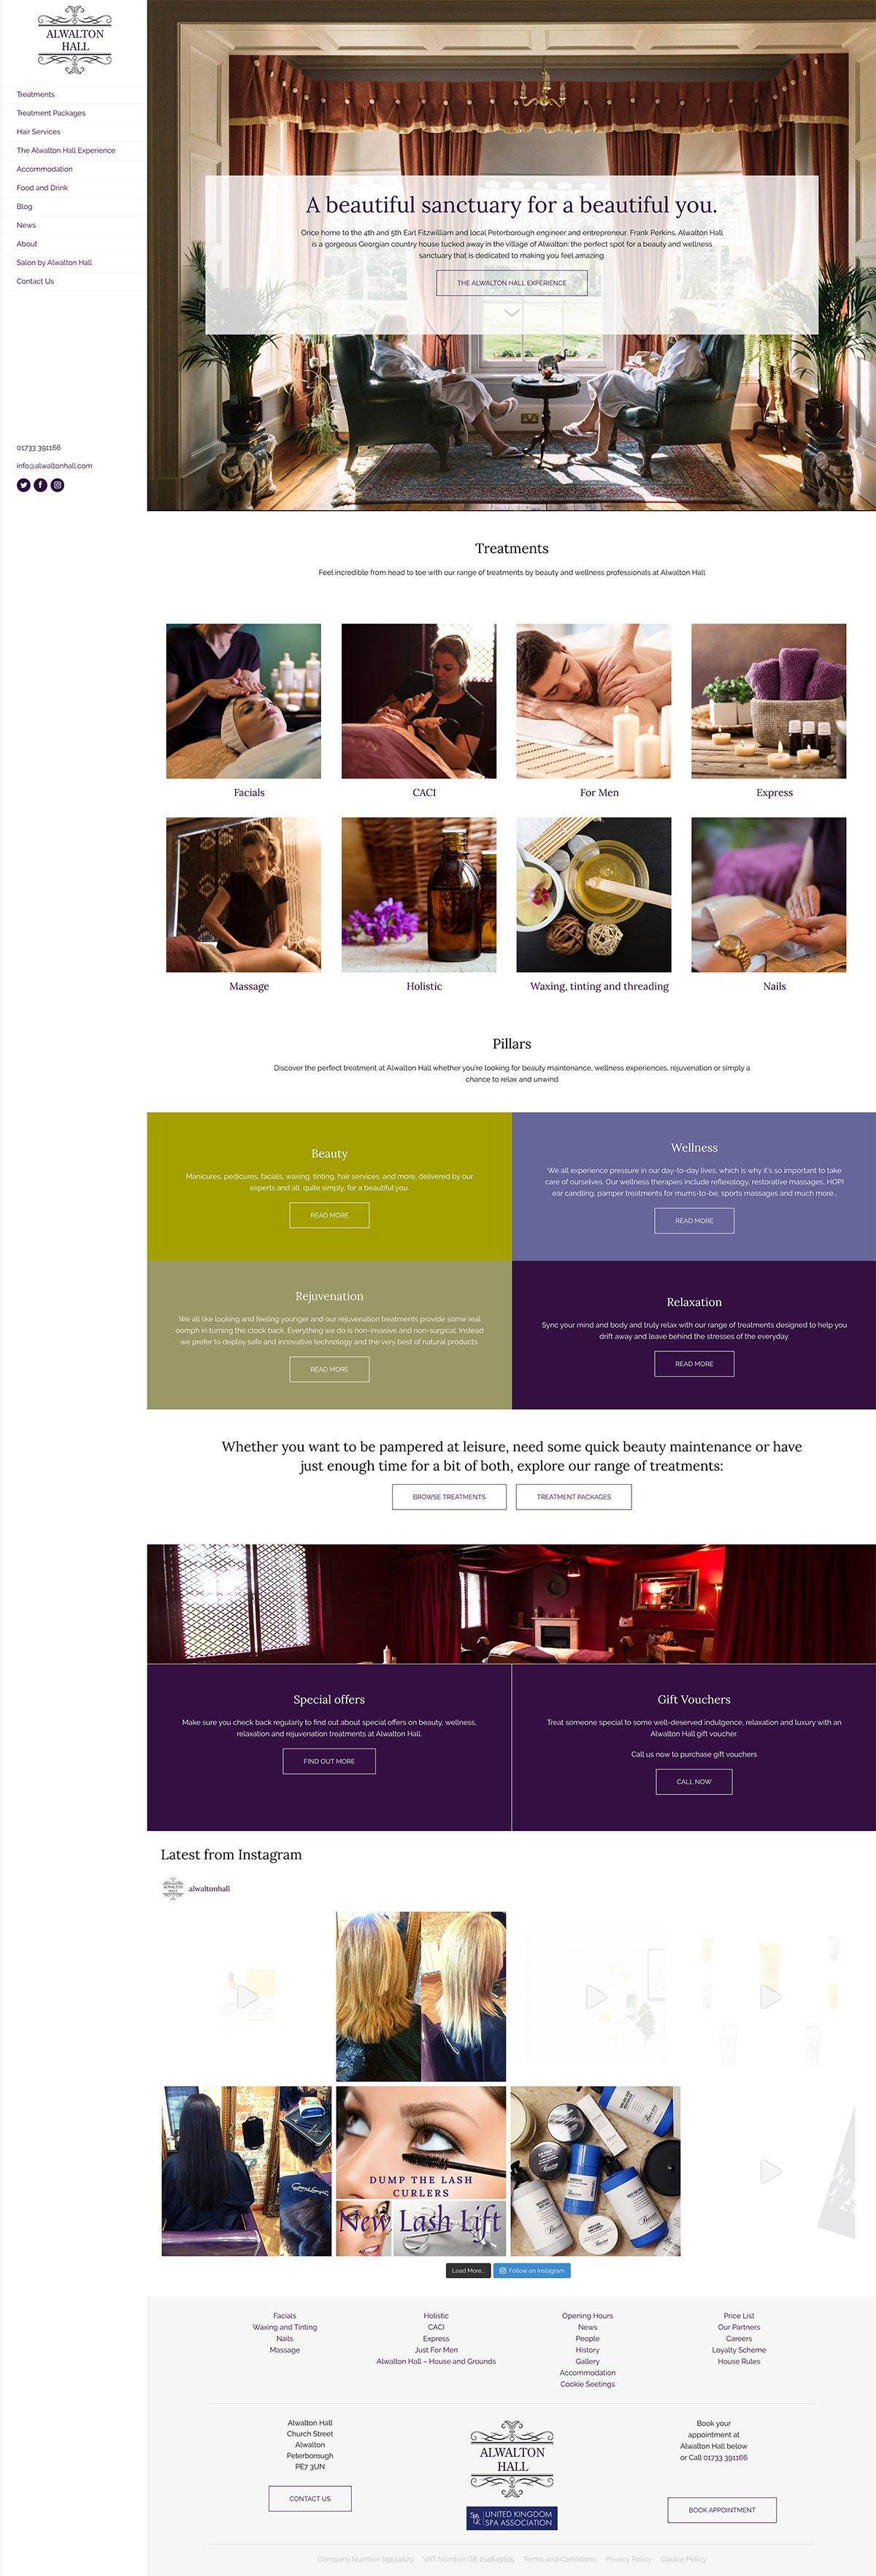 Alwalton Hall Homepage Screenshot